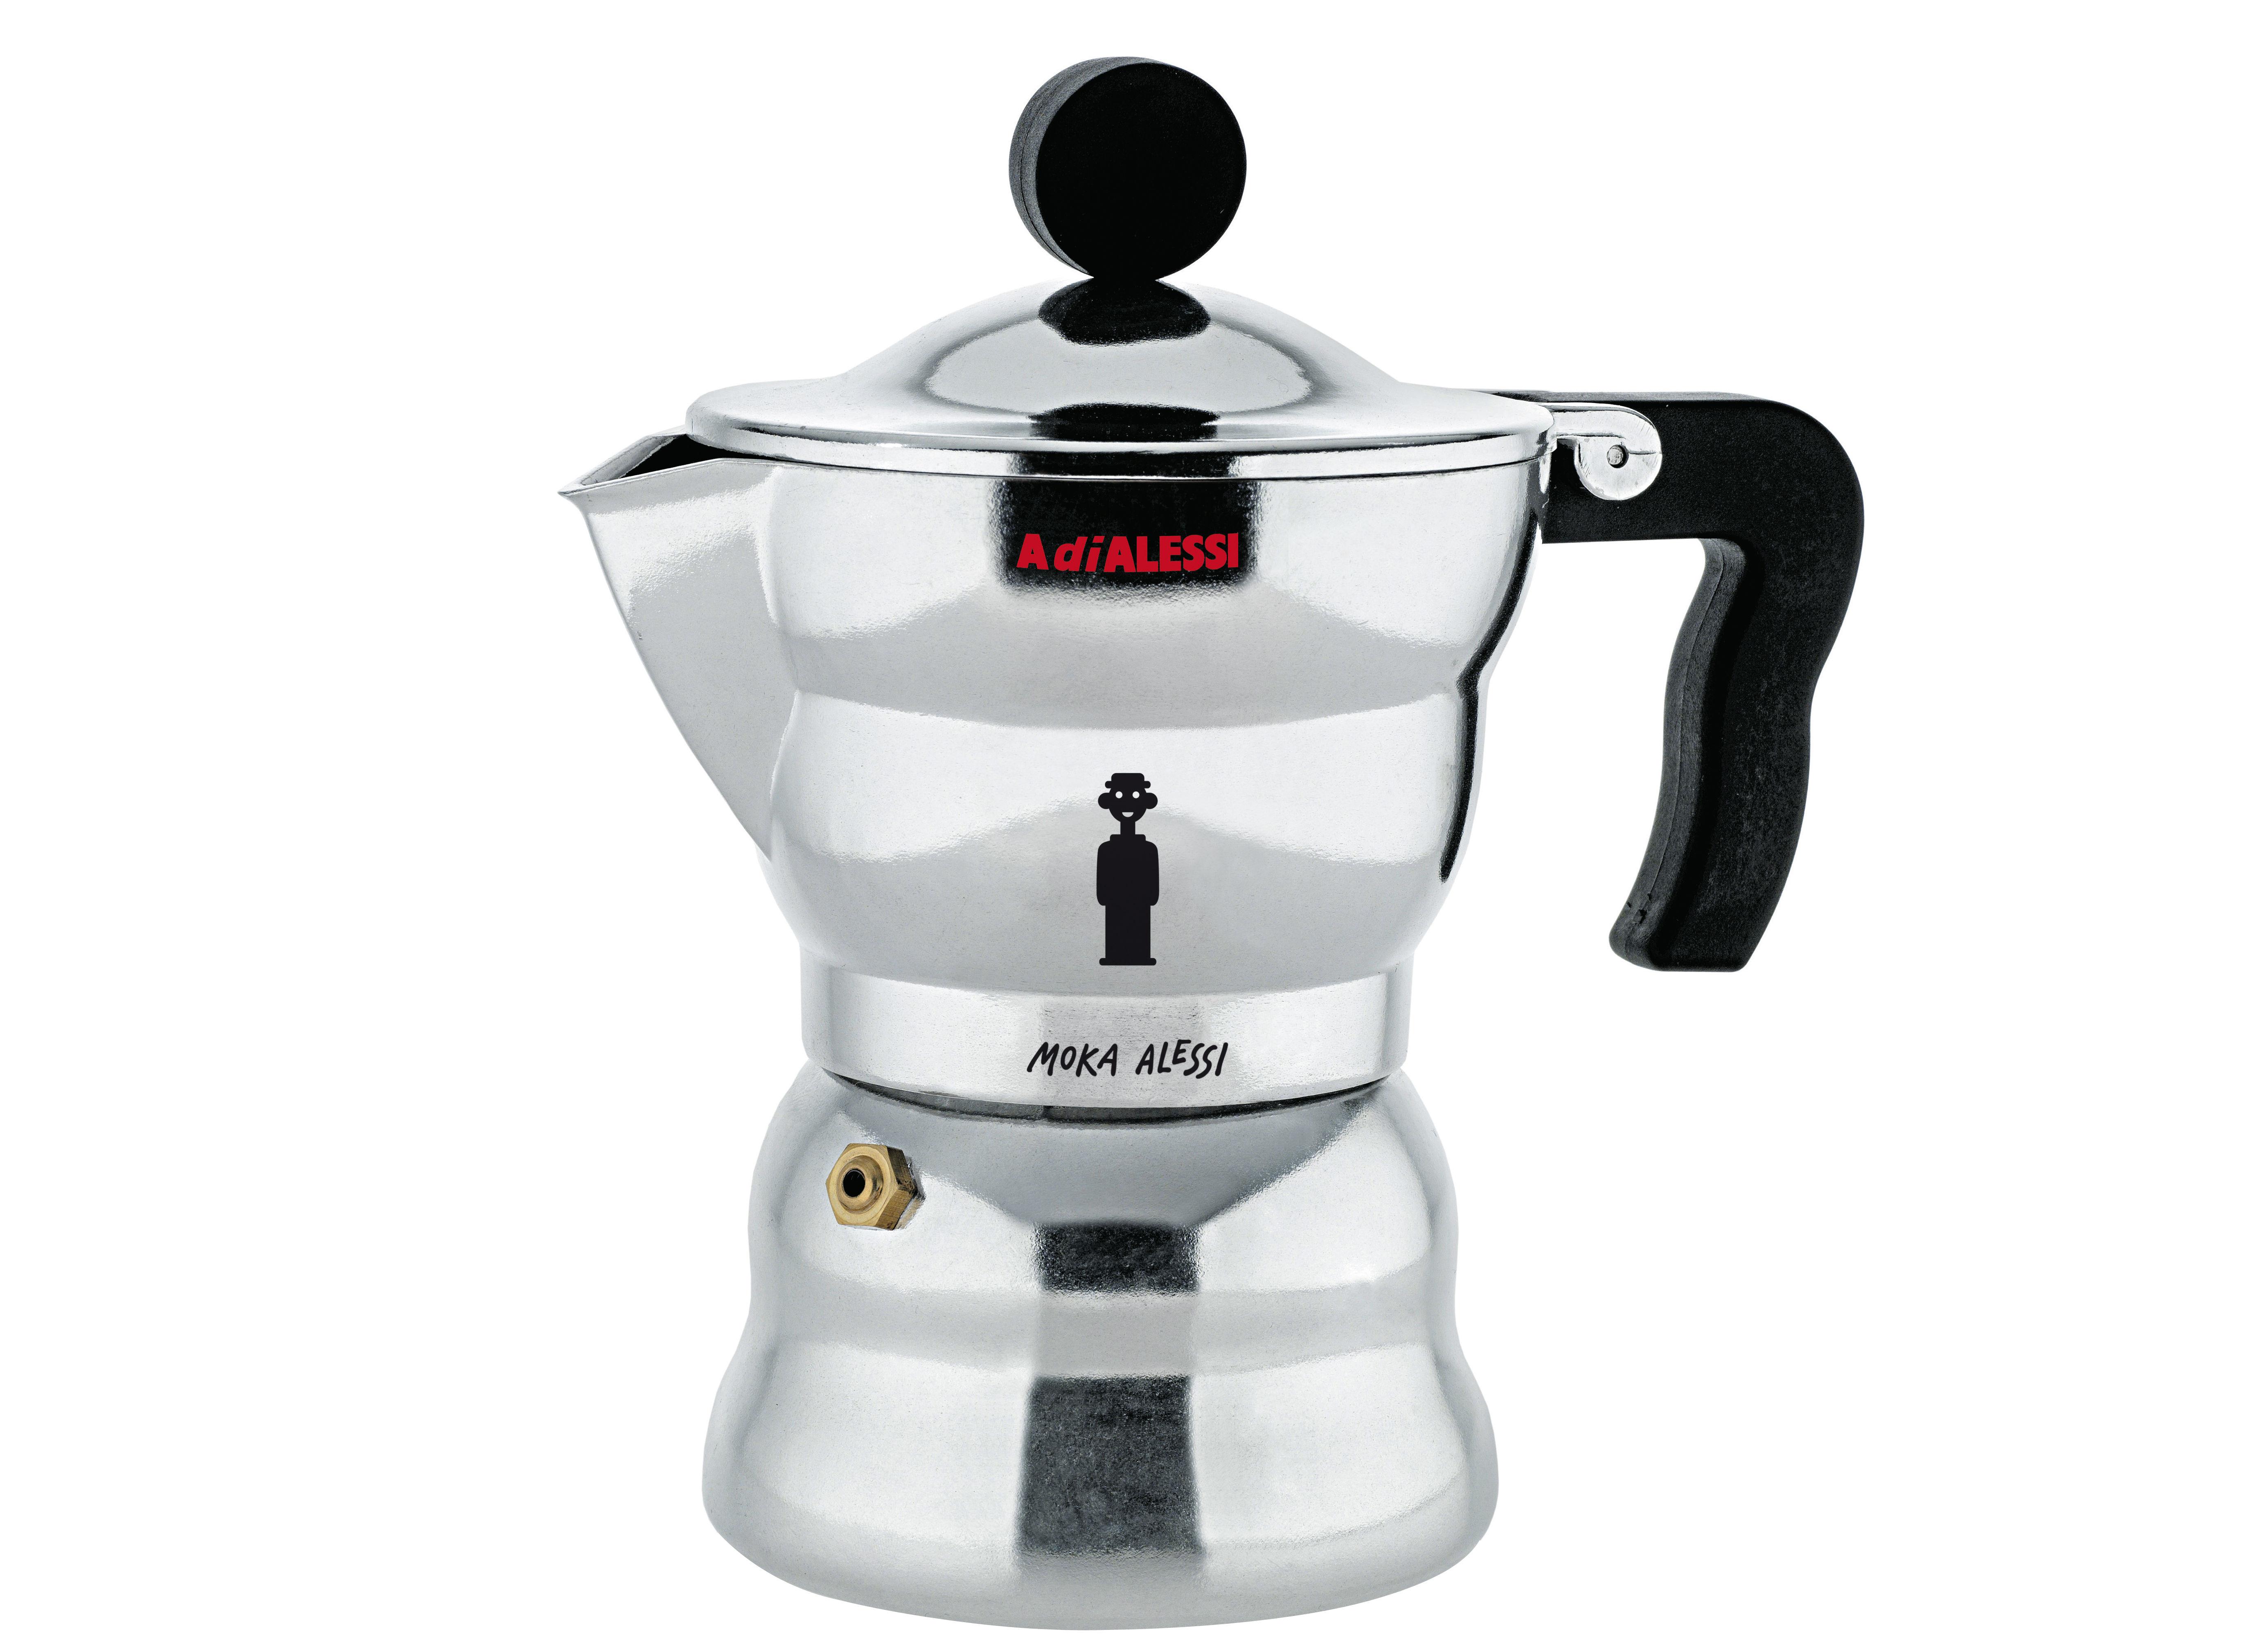 Moka Italian espresso maker - 3 cups Polished aluminium - 15 cl by A di Alessi